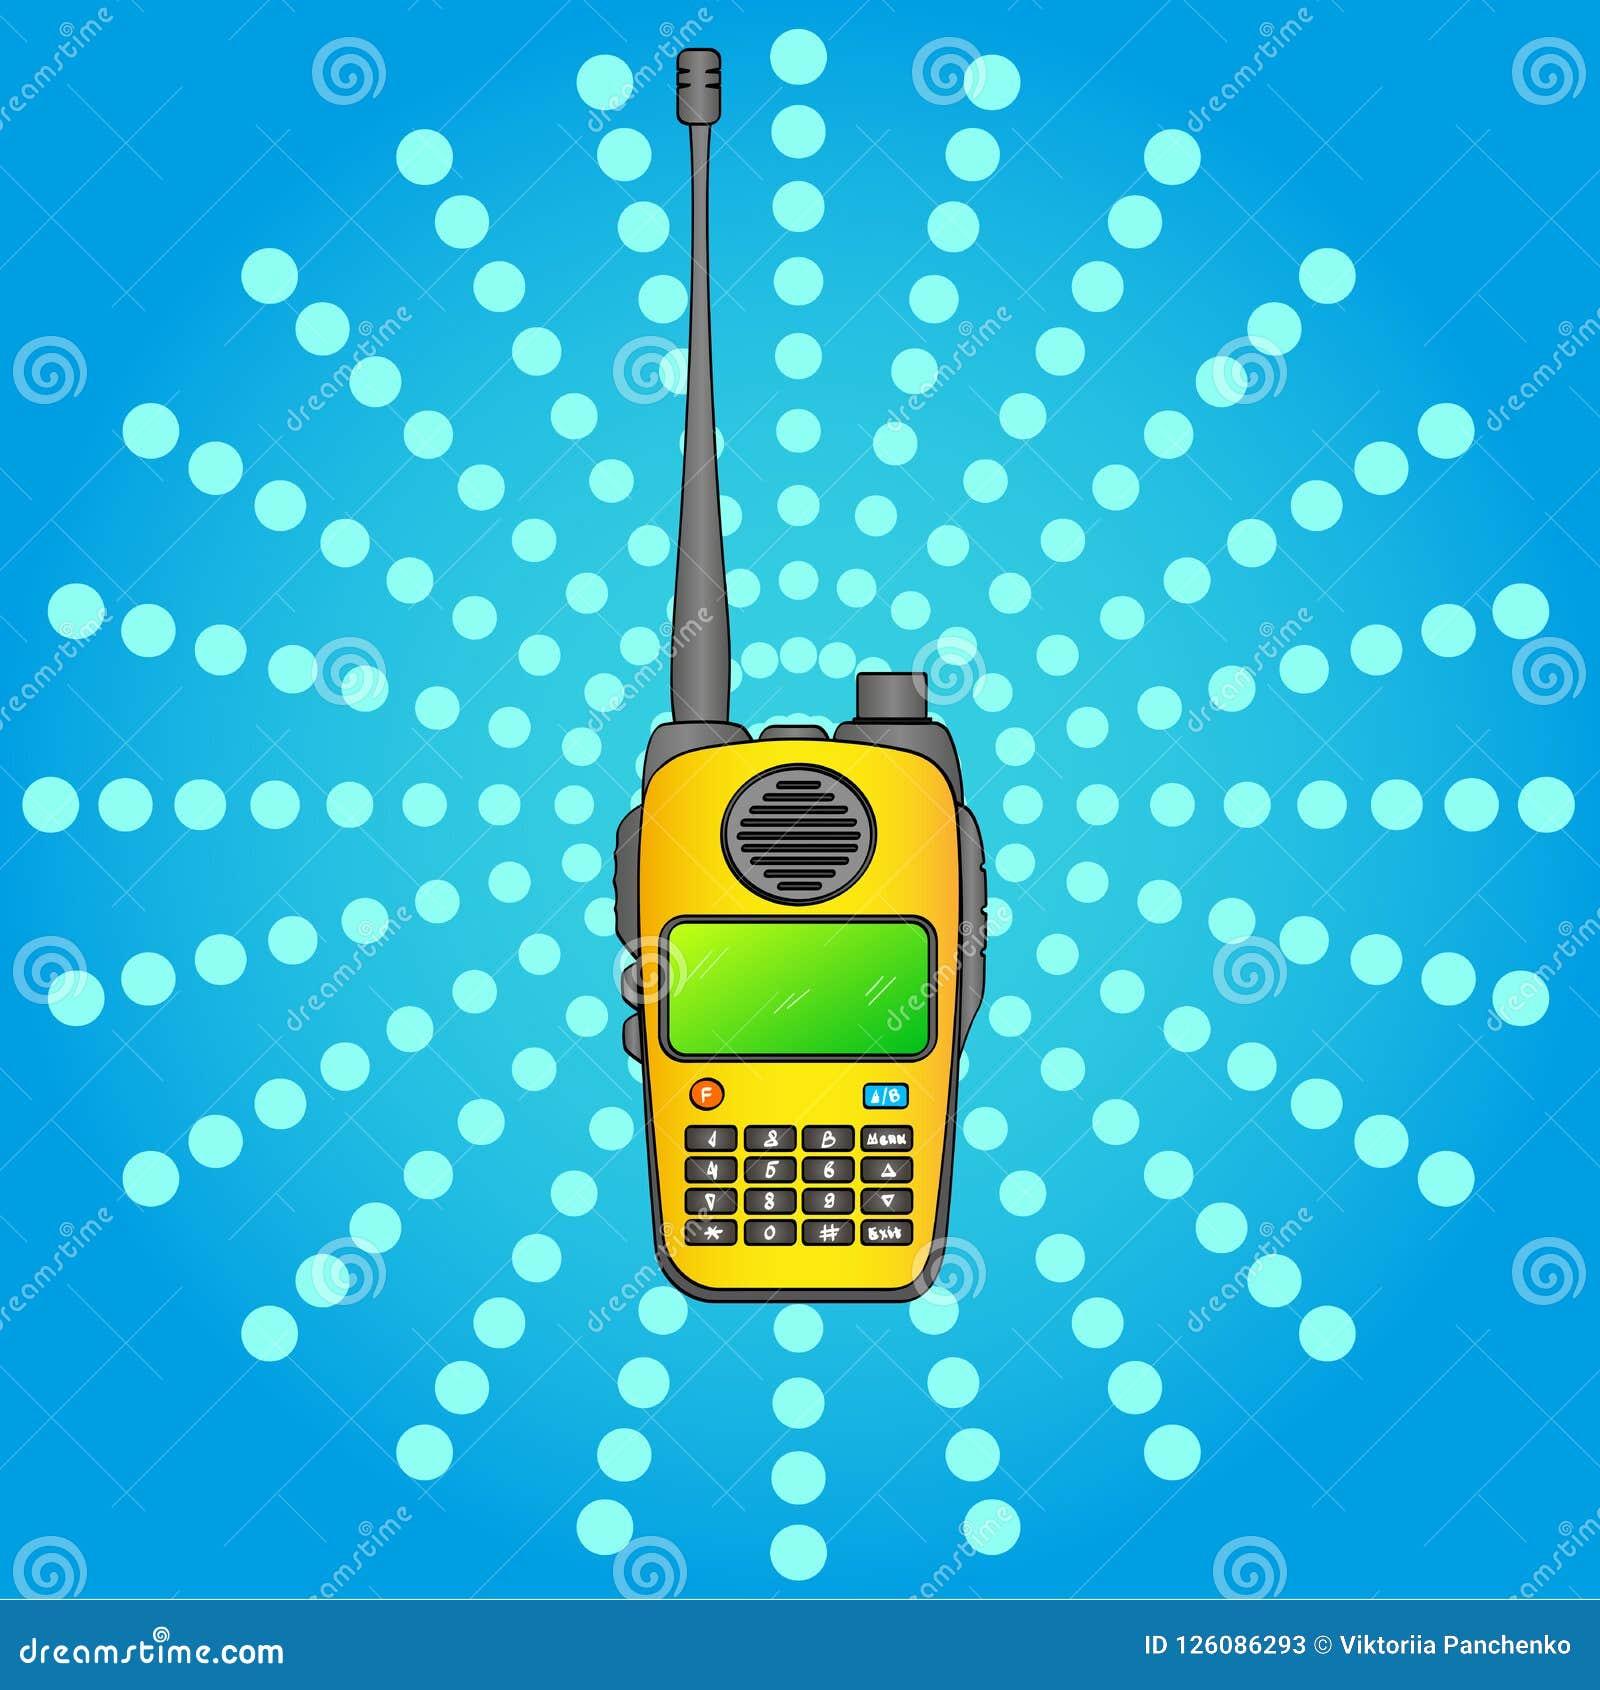 Walkie Talkie  Radio Station  Portable Receiving Transceiver